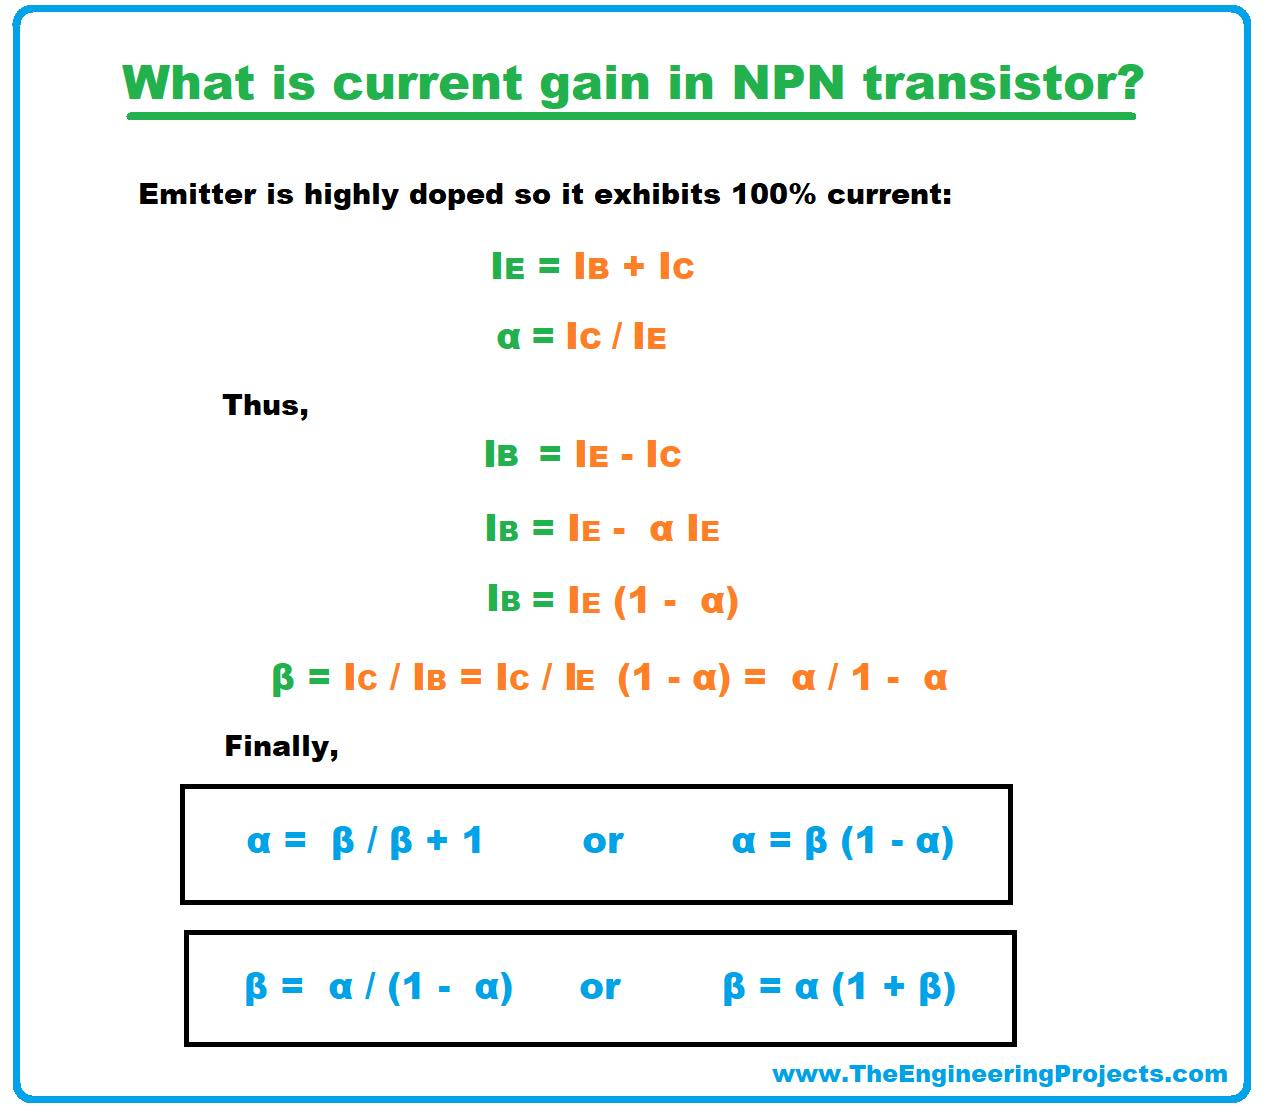 NPN transistor, what is NPN transistor, NPN transistor symbol, NPN transistor circuit, NPN transistor formula, NPN transistor current gain, NPN transistor collector current, npn transistor current gain